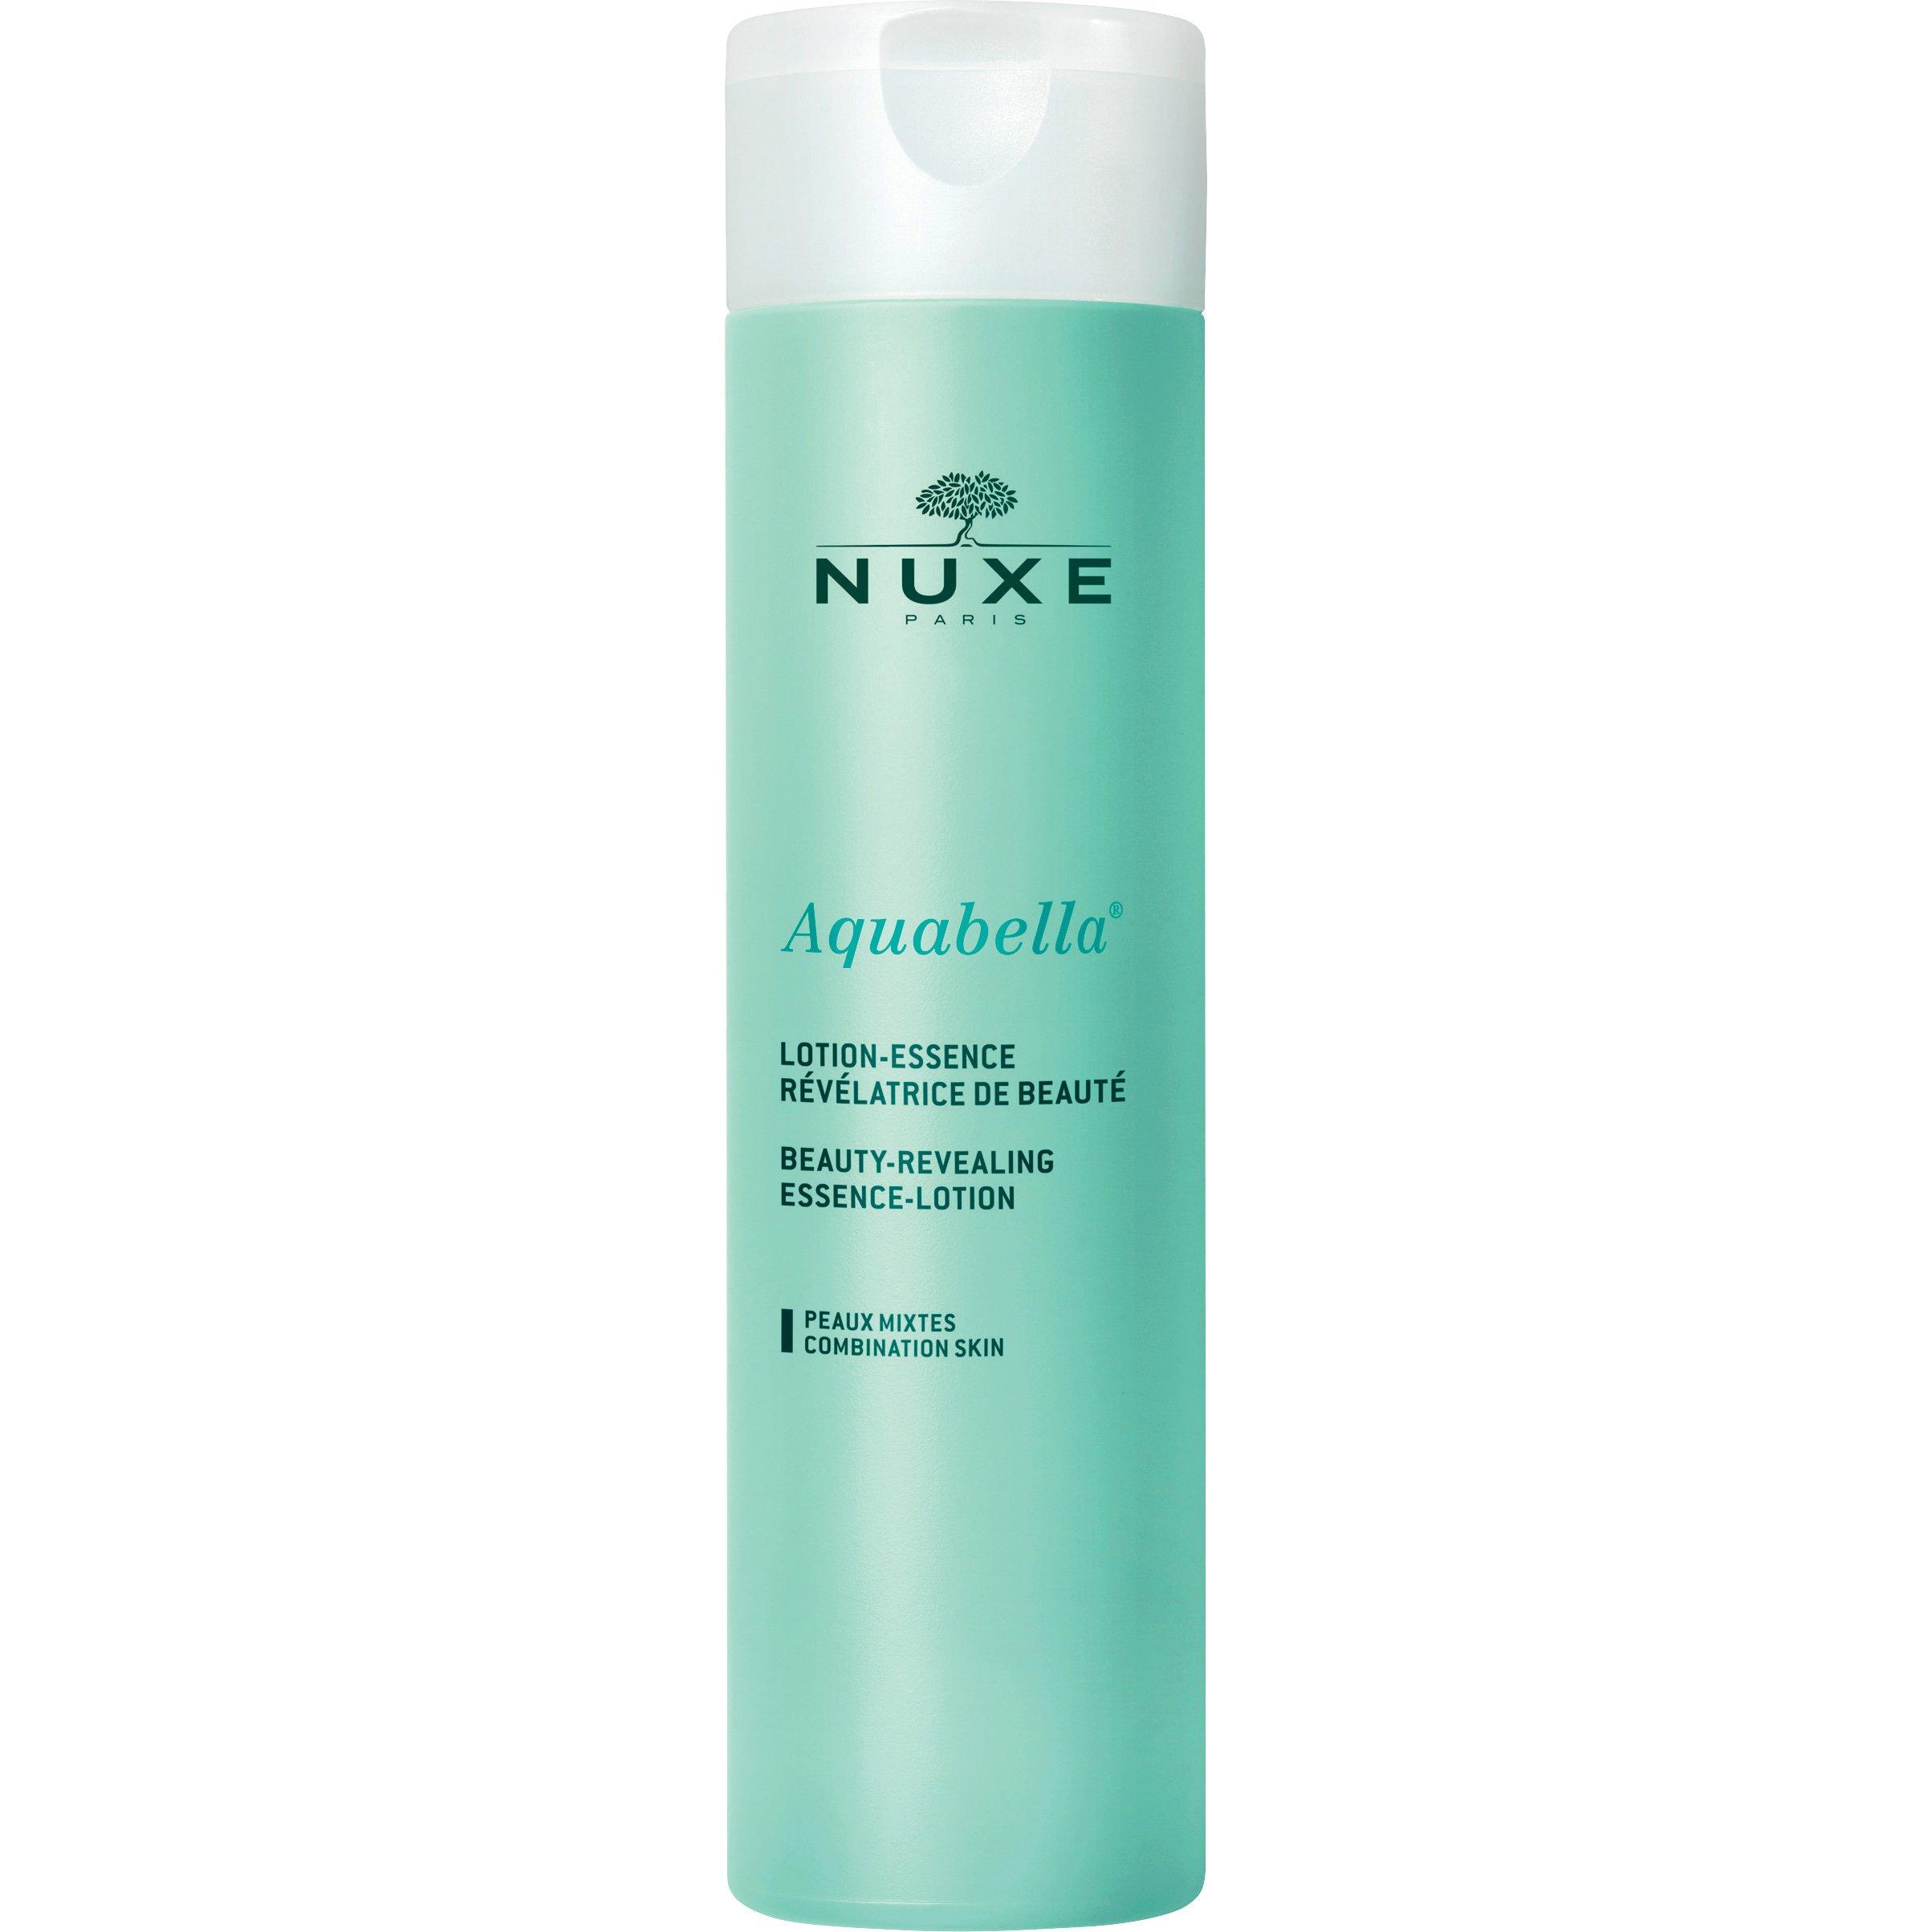 Nuxe Aquabella Beauty-Revealing Essence-Lotion Τονωτική Λοσιόν Καθαρισμού Προσώπου για Κανονικές – Μικτές Επιδερμίδες 200ml